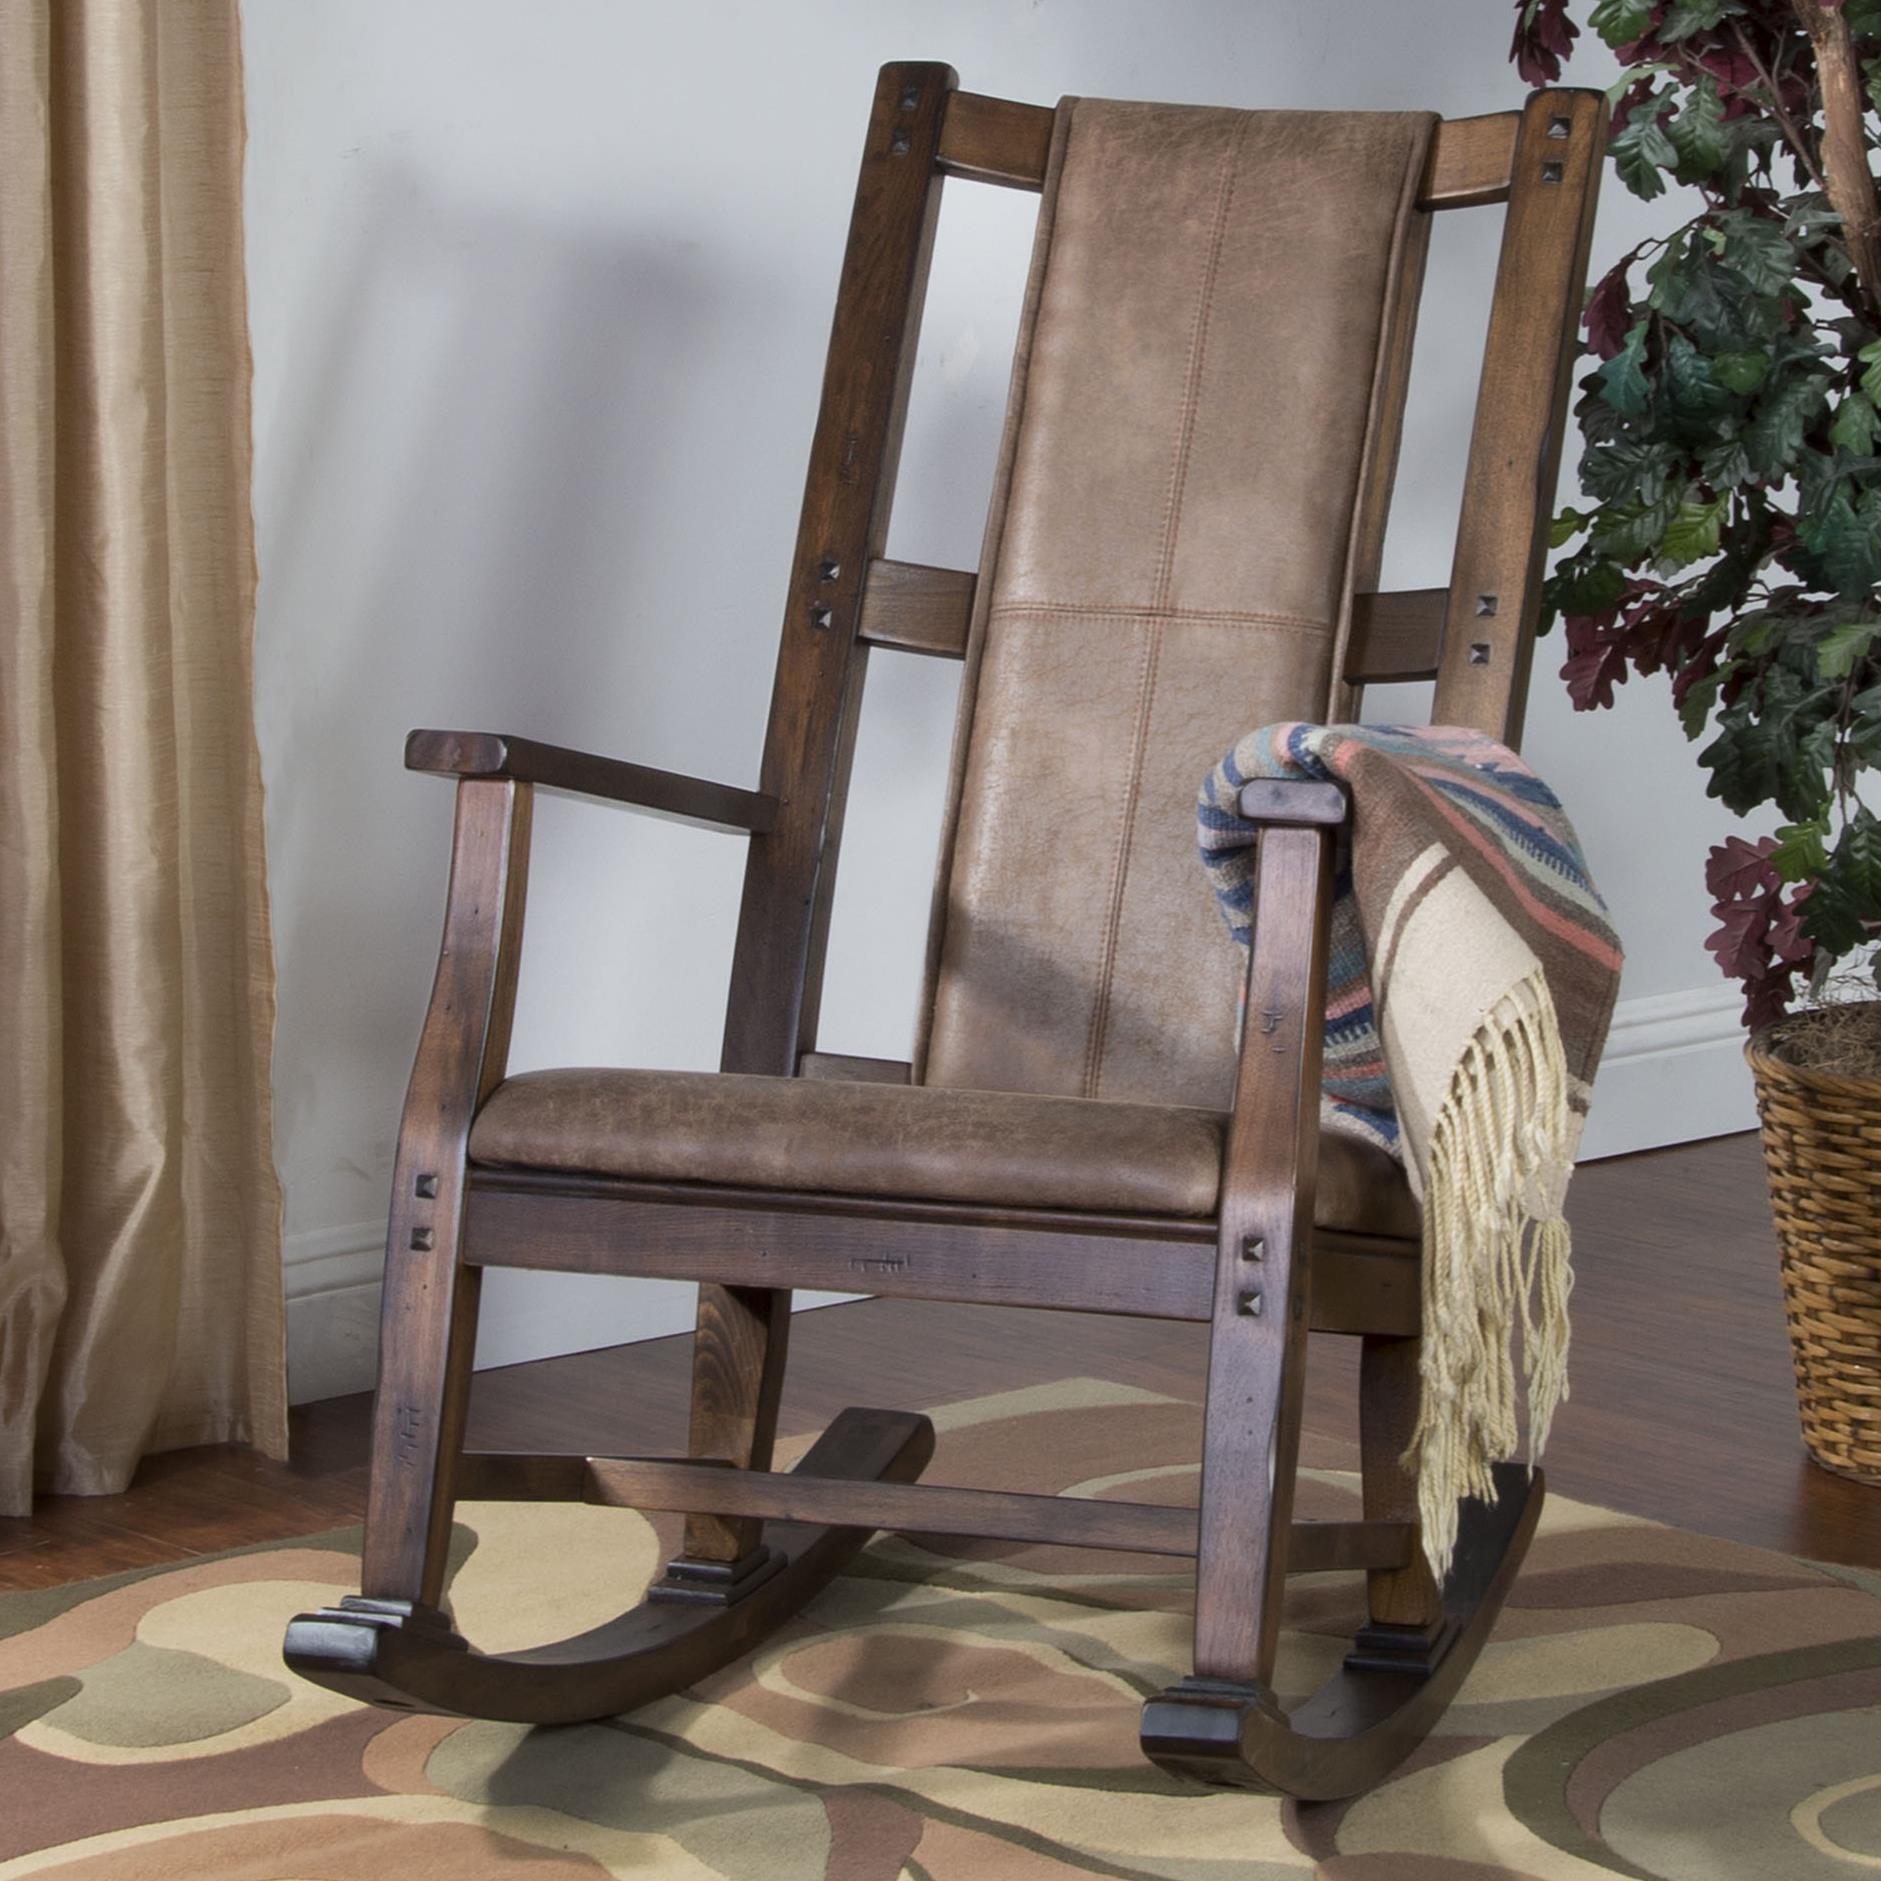 Savannah Rocker w/ Cusion Seat & Back by Sunny Designs at Walker's Furniture